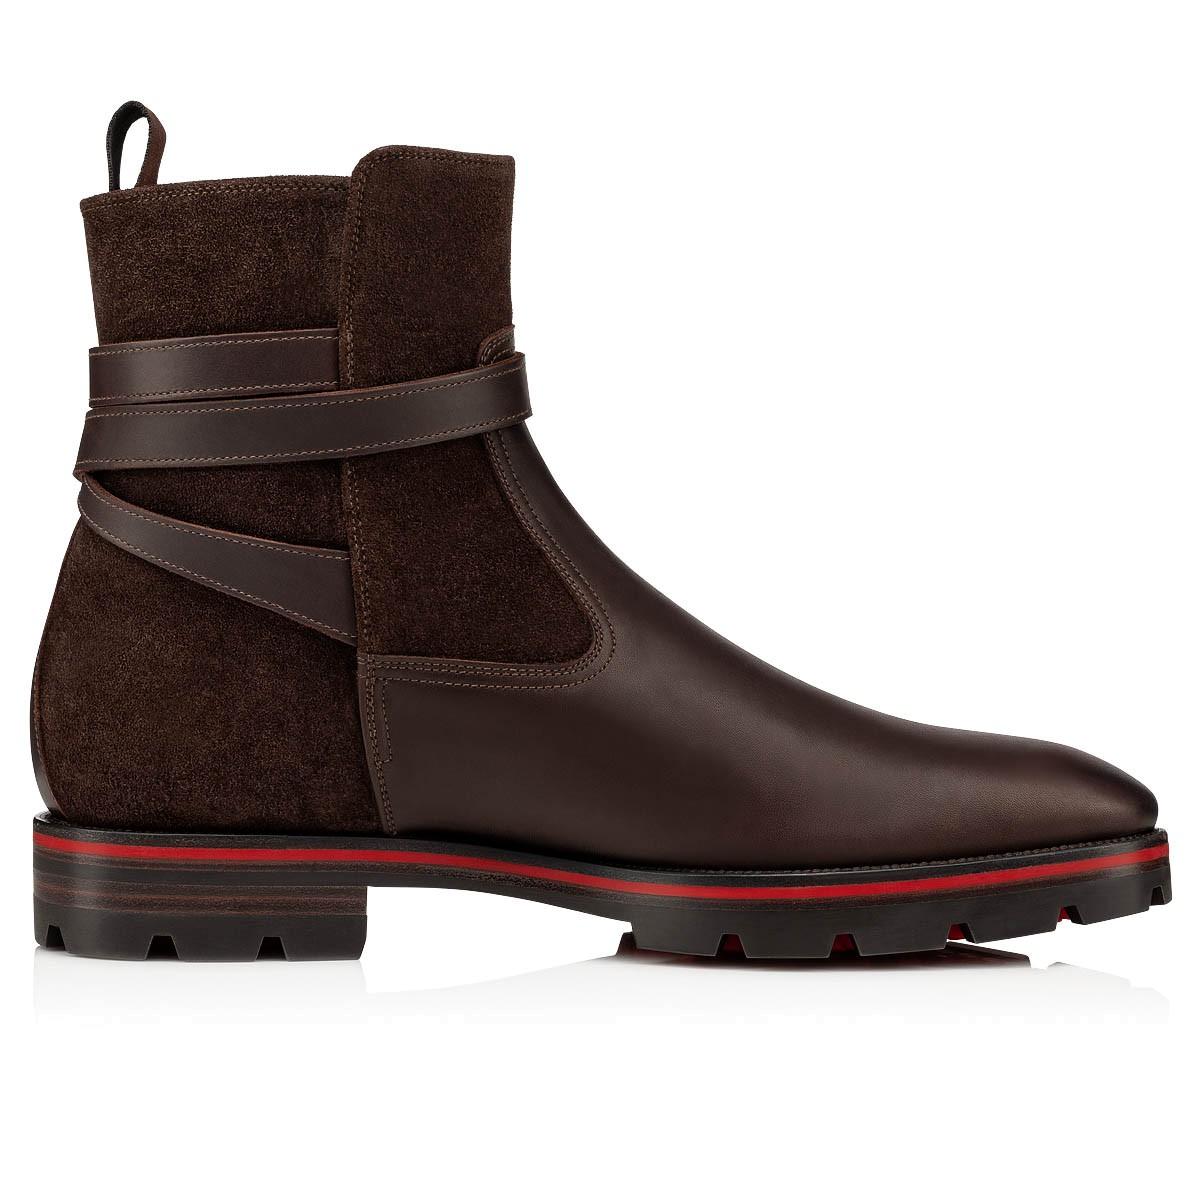 Shoes - Kicko Croc - Christian Louboutin